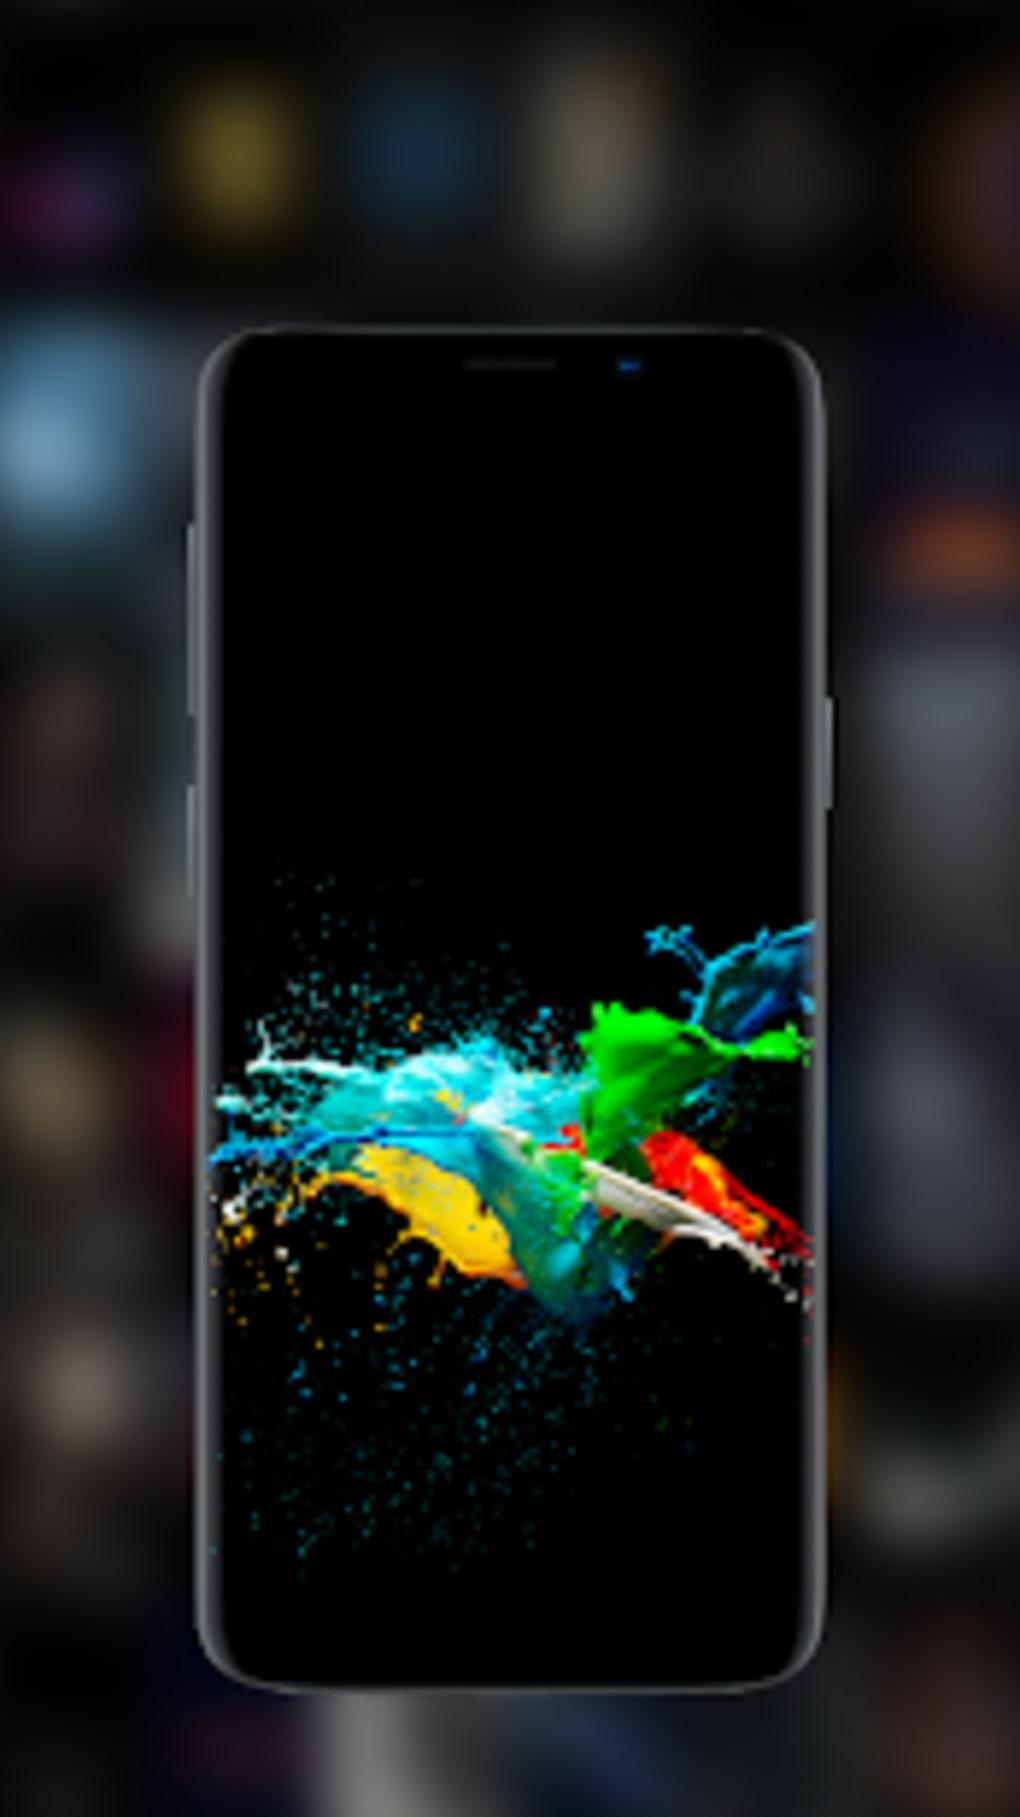 4k Dark Amoled Backgrounds Dark Wallpapers 4k Mobile 2963392 Hd Wallpaper Backgrounds Download